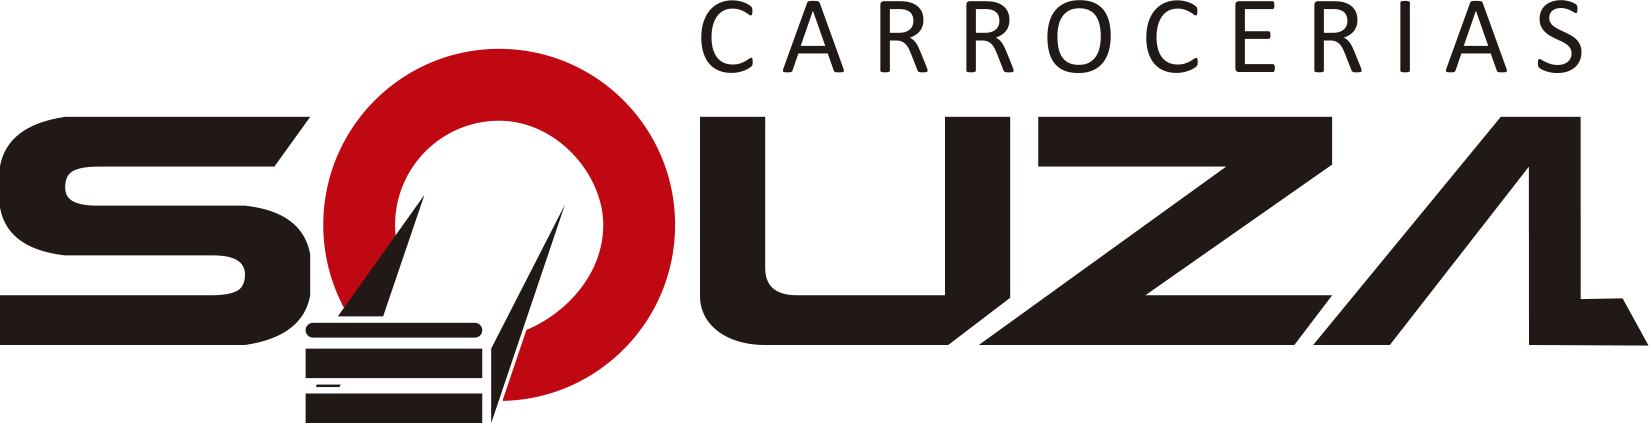 Carrocerias Souza